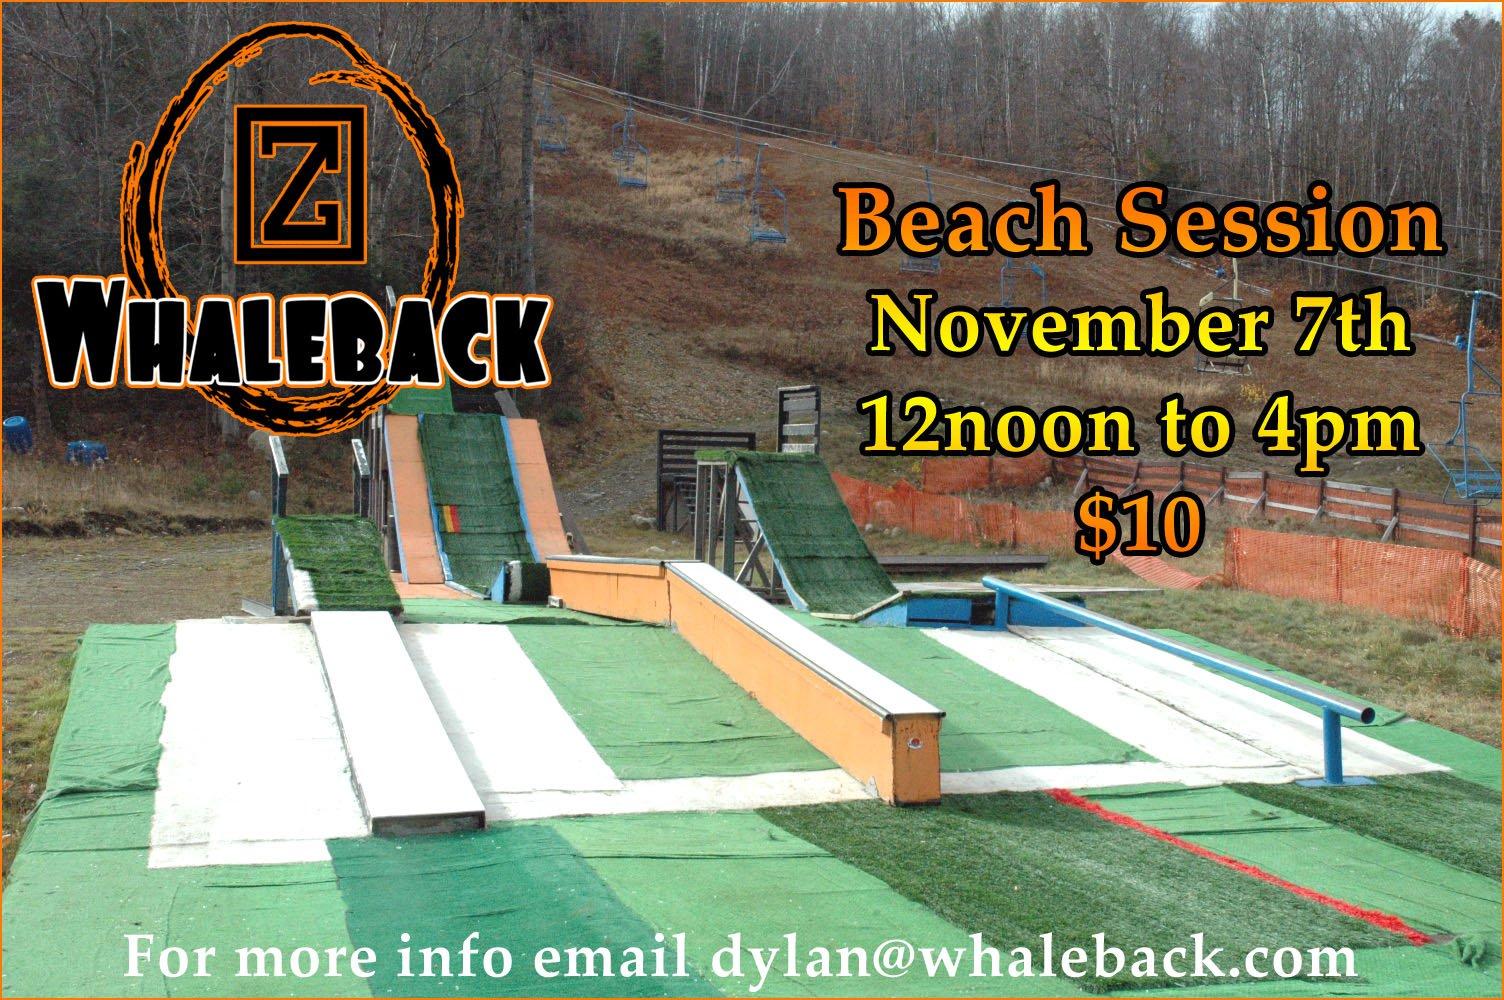 November 7th Beach Session